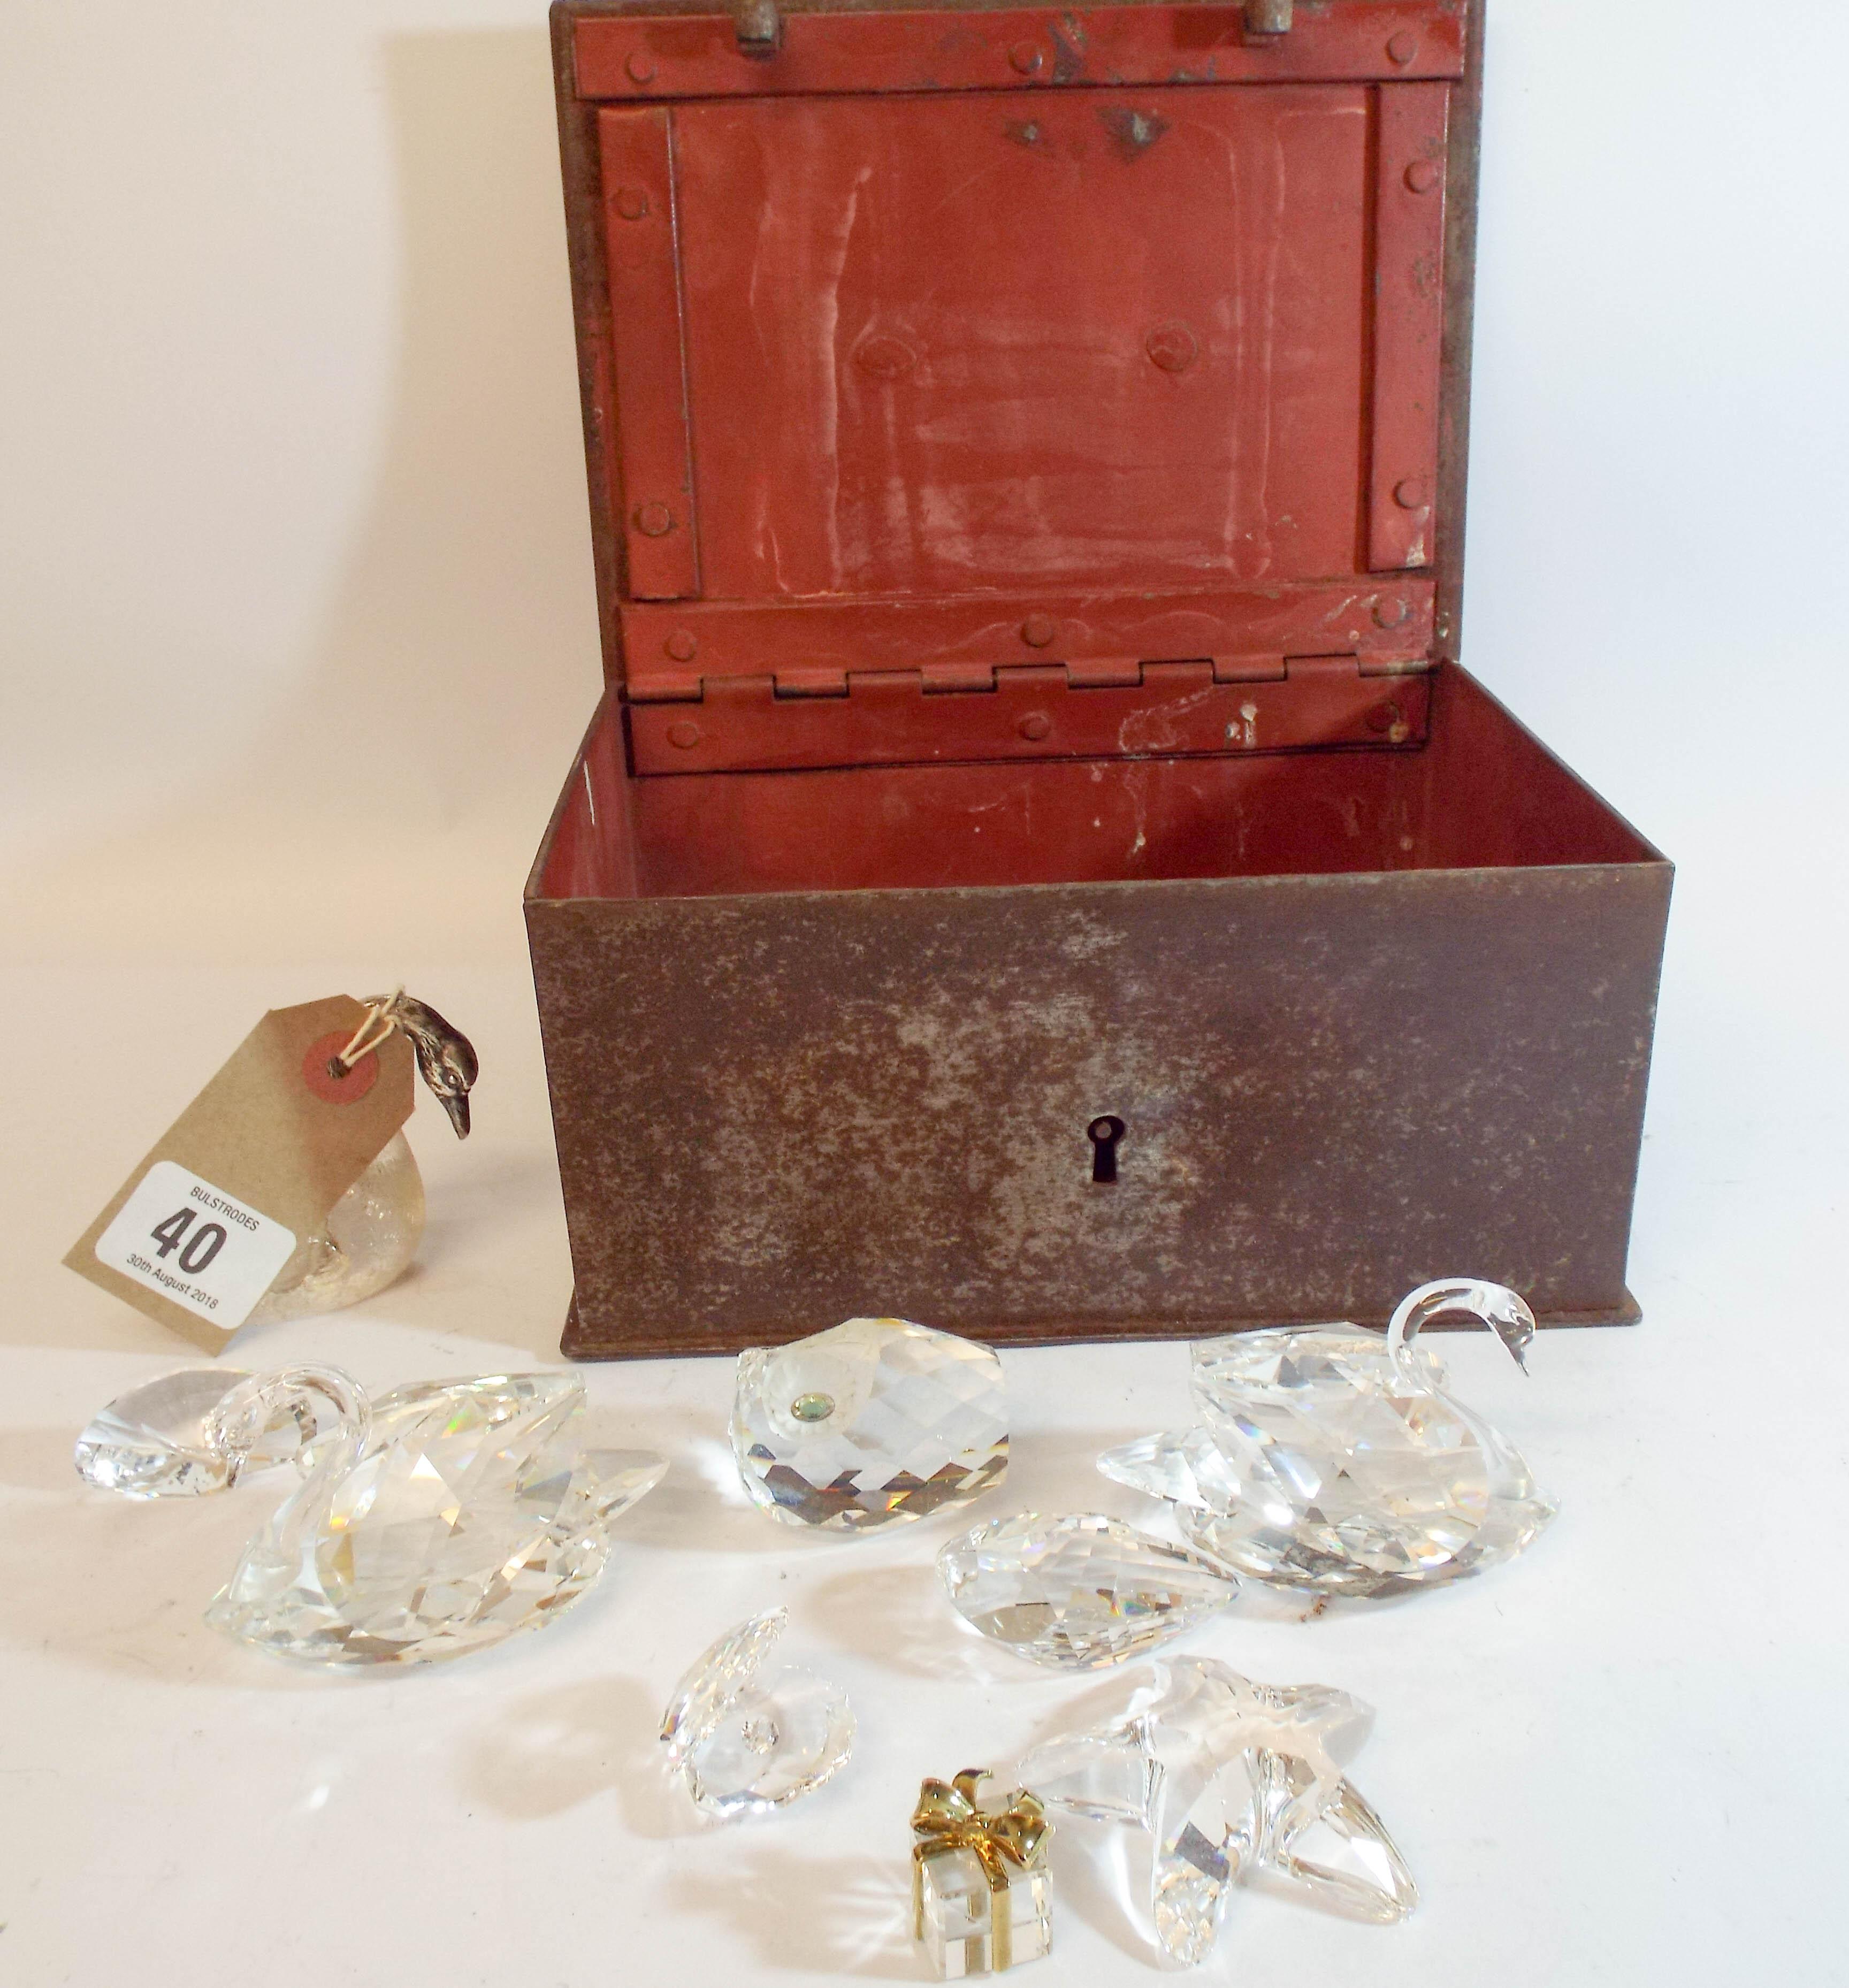 47840bdac894 Lotto 40 - An antique locking metal box containing Swarovski crystal animals  and birds ...